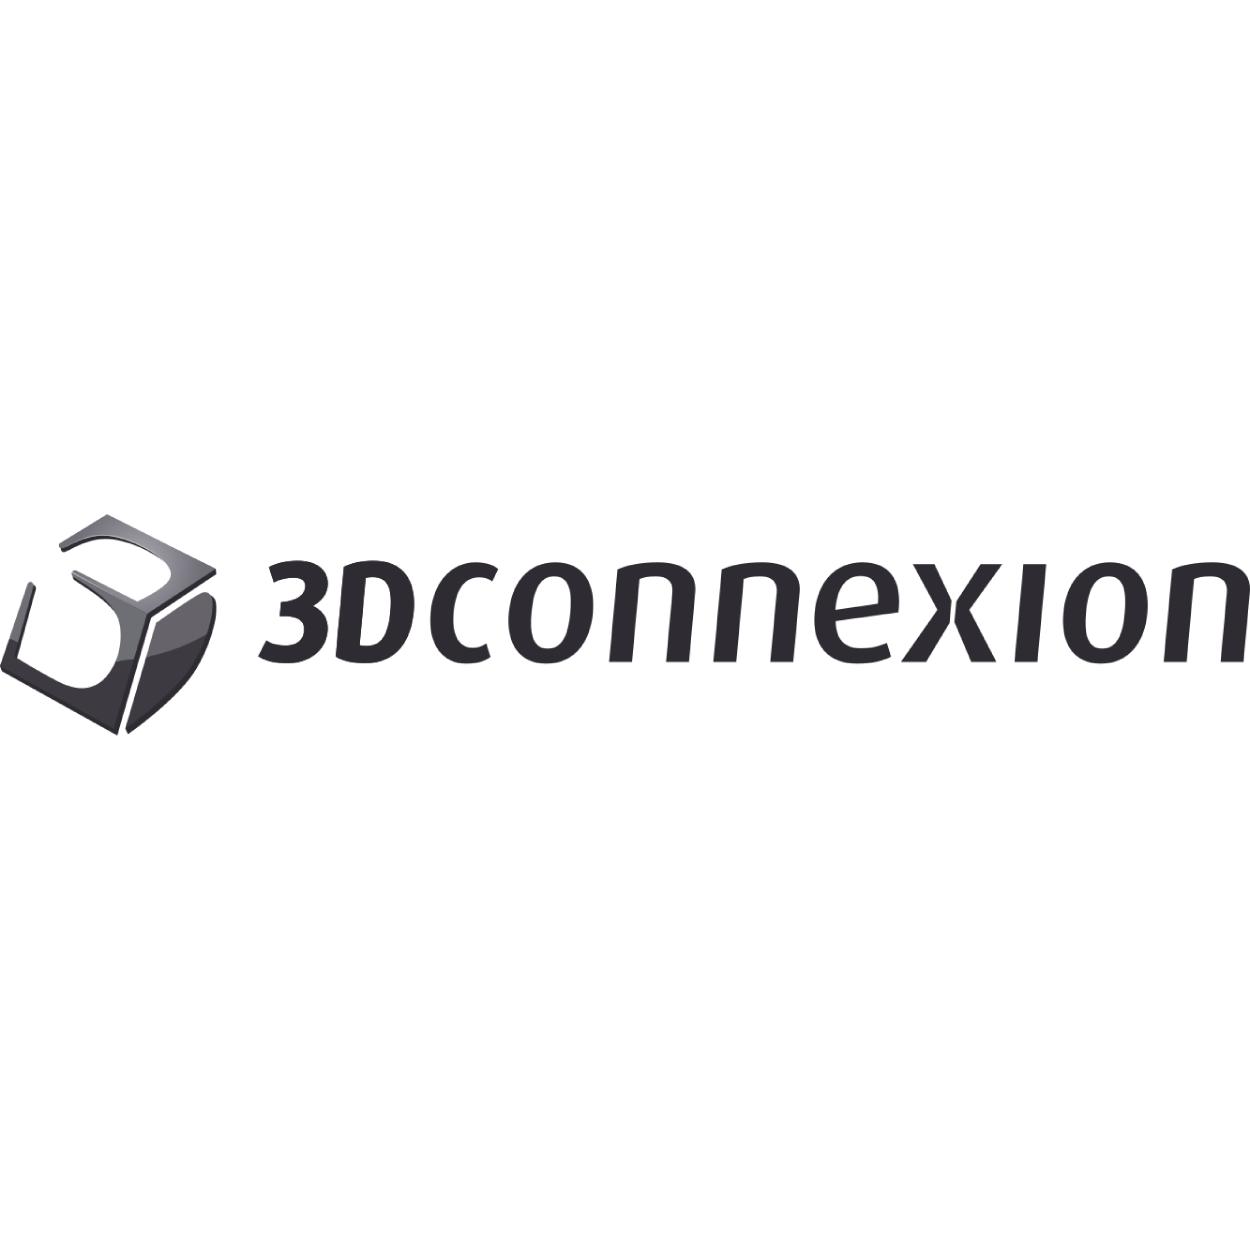 3D Connexion_Tavola disegno 1